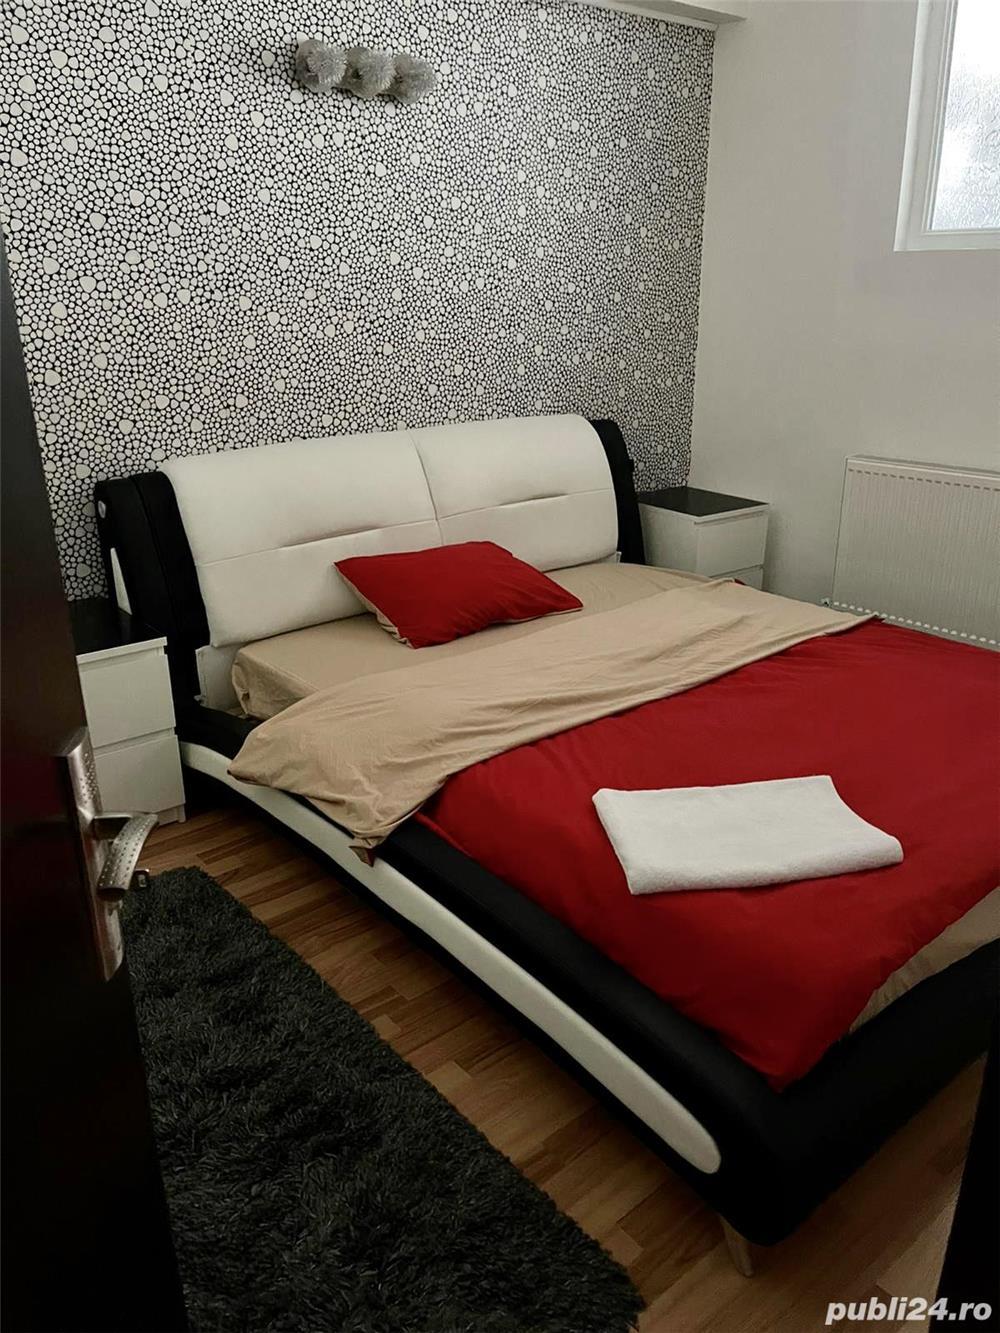 Regim hotelier Inchiriez apartment 3 camere